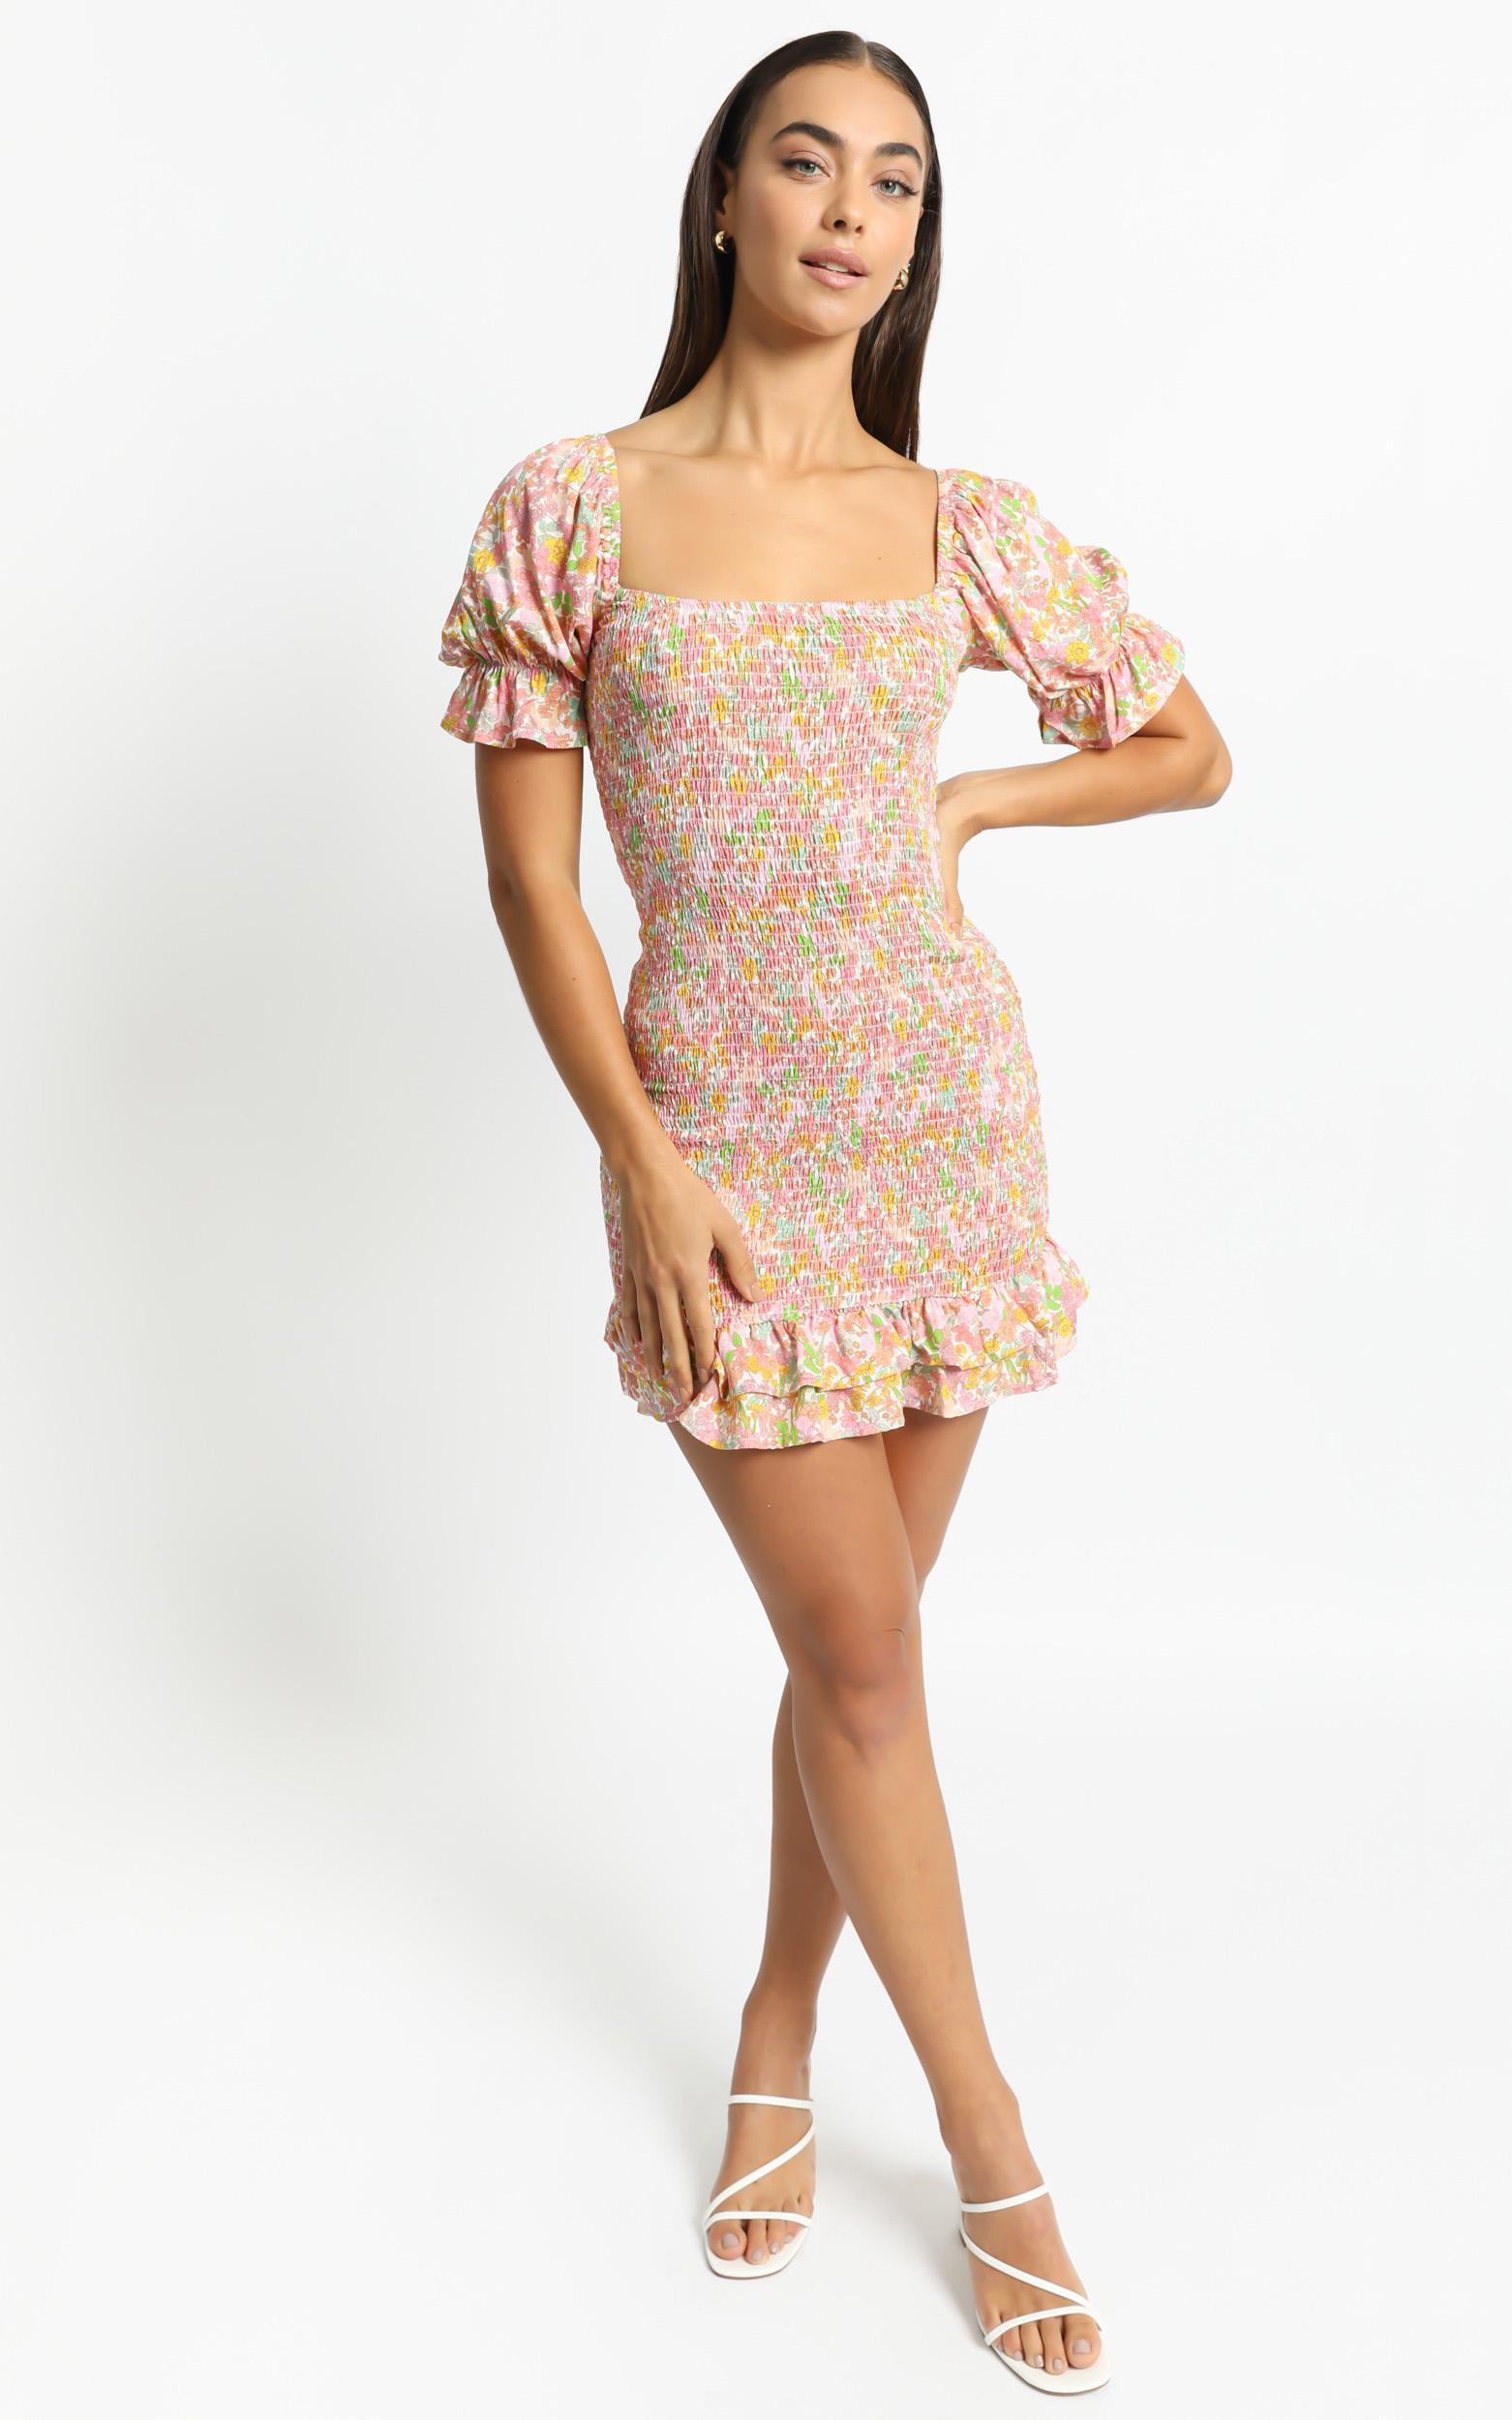 Lilja Dress in Flower Field - 6 (XS), Pink, hi-res image number null